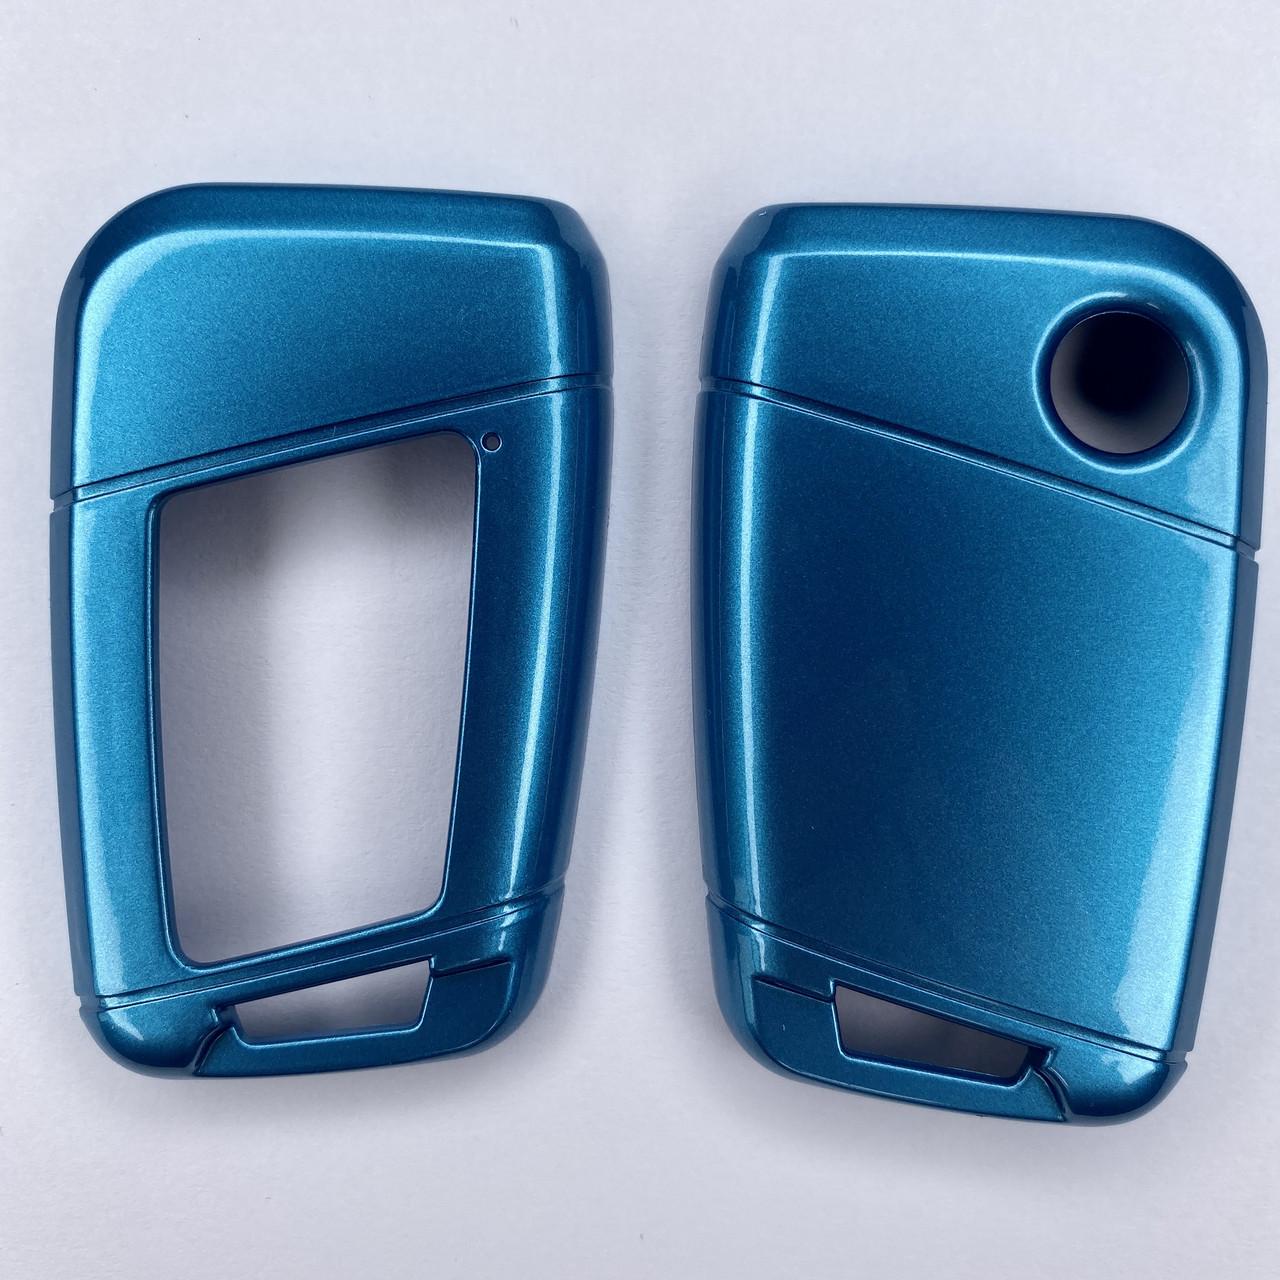 Пластиковый чехол для ключа Volkswagen Passat,Golf,Tiguan,Touareg,Polo, Jetta,Amarok,Beetle,Bora,Сaddy,Passat